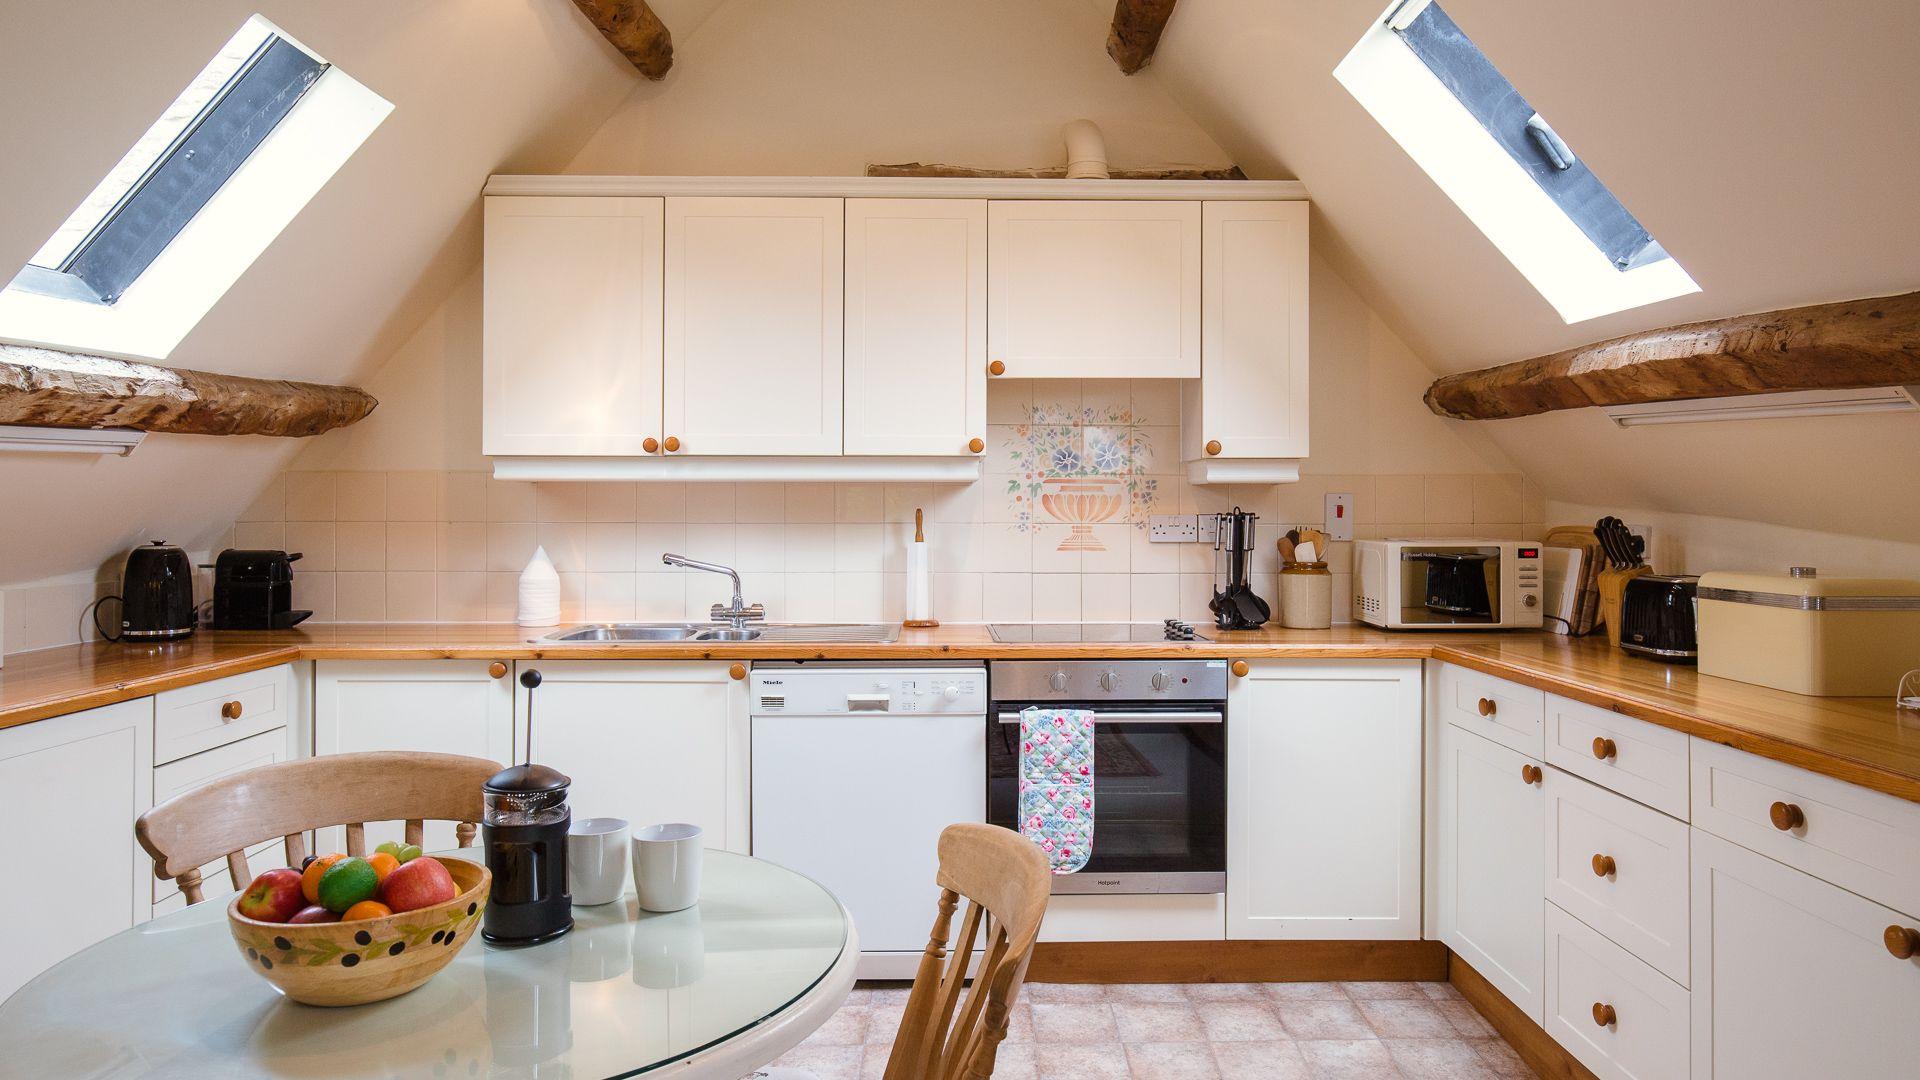 Kitchen, Hayloft at Newbarn Farm, Bolthole Retreats